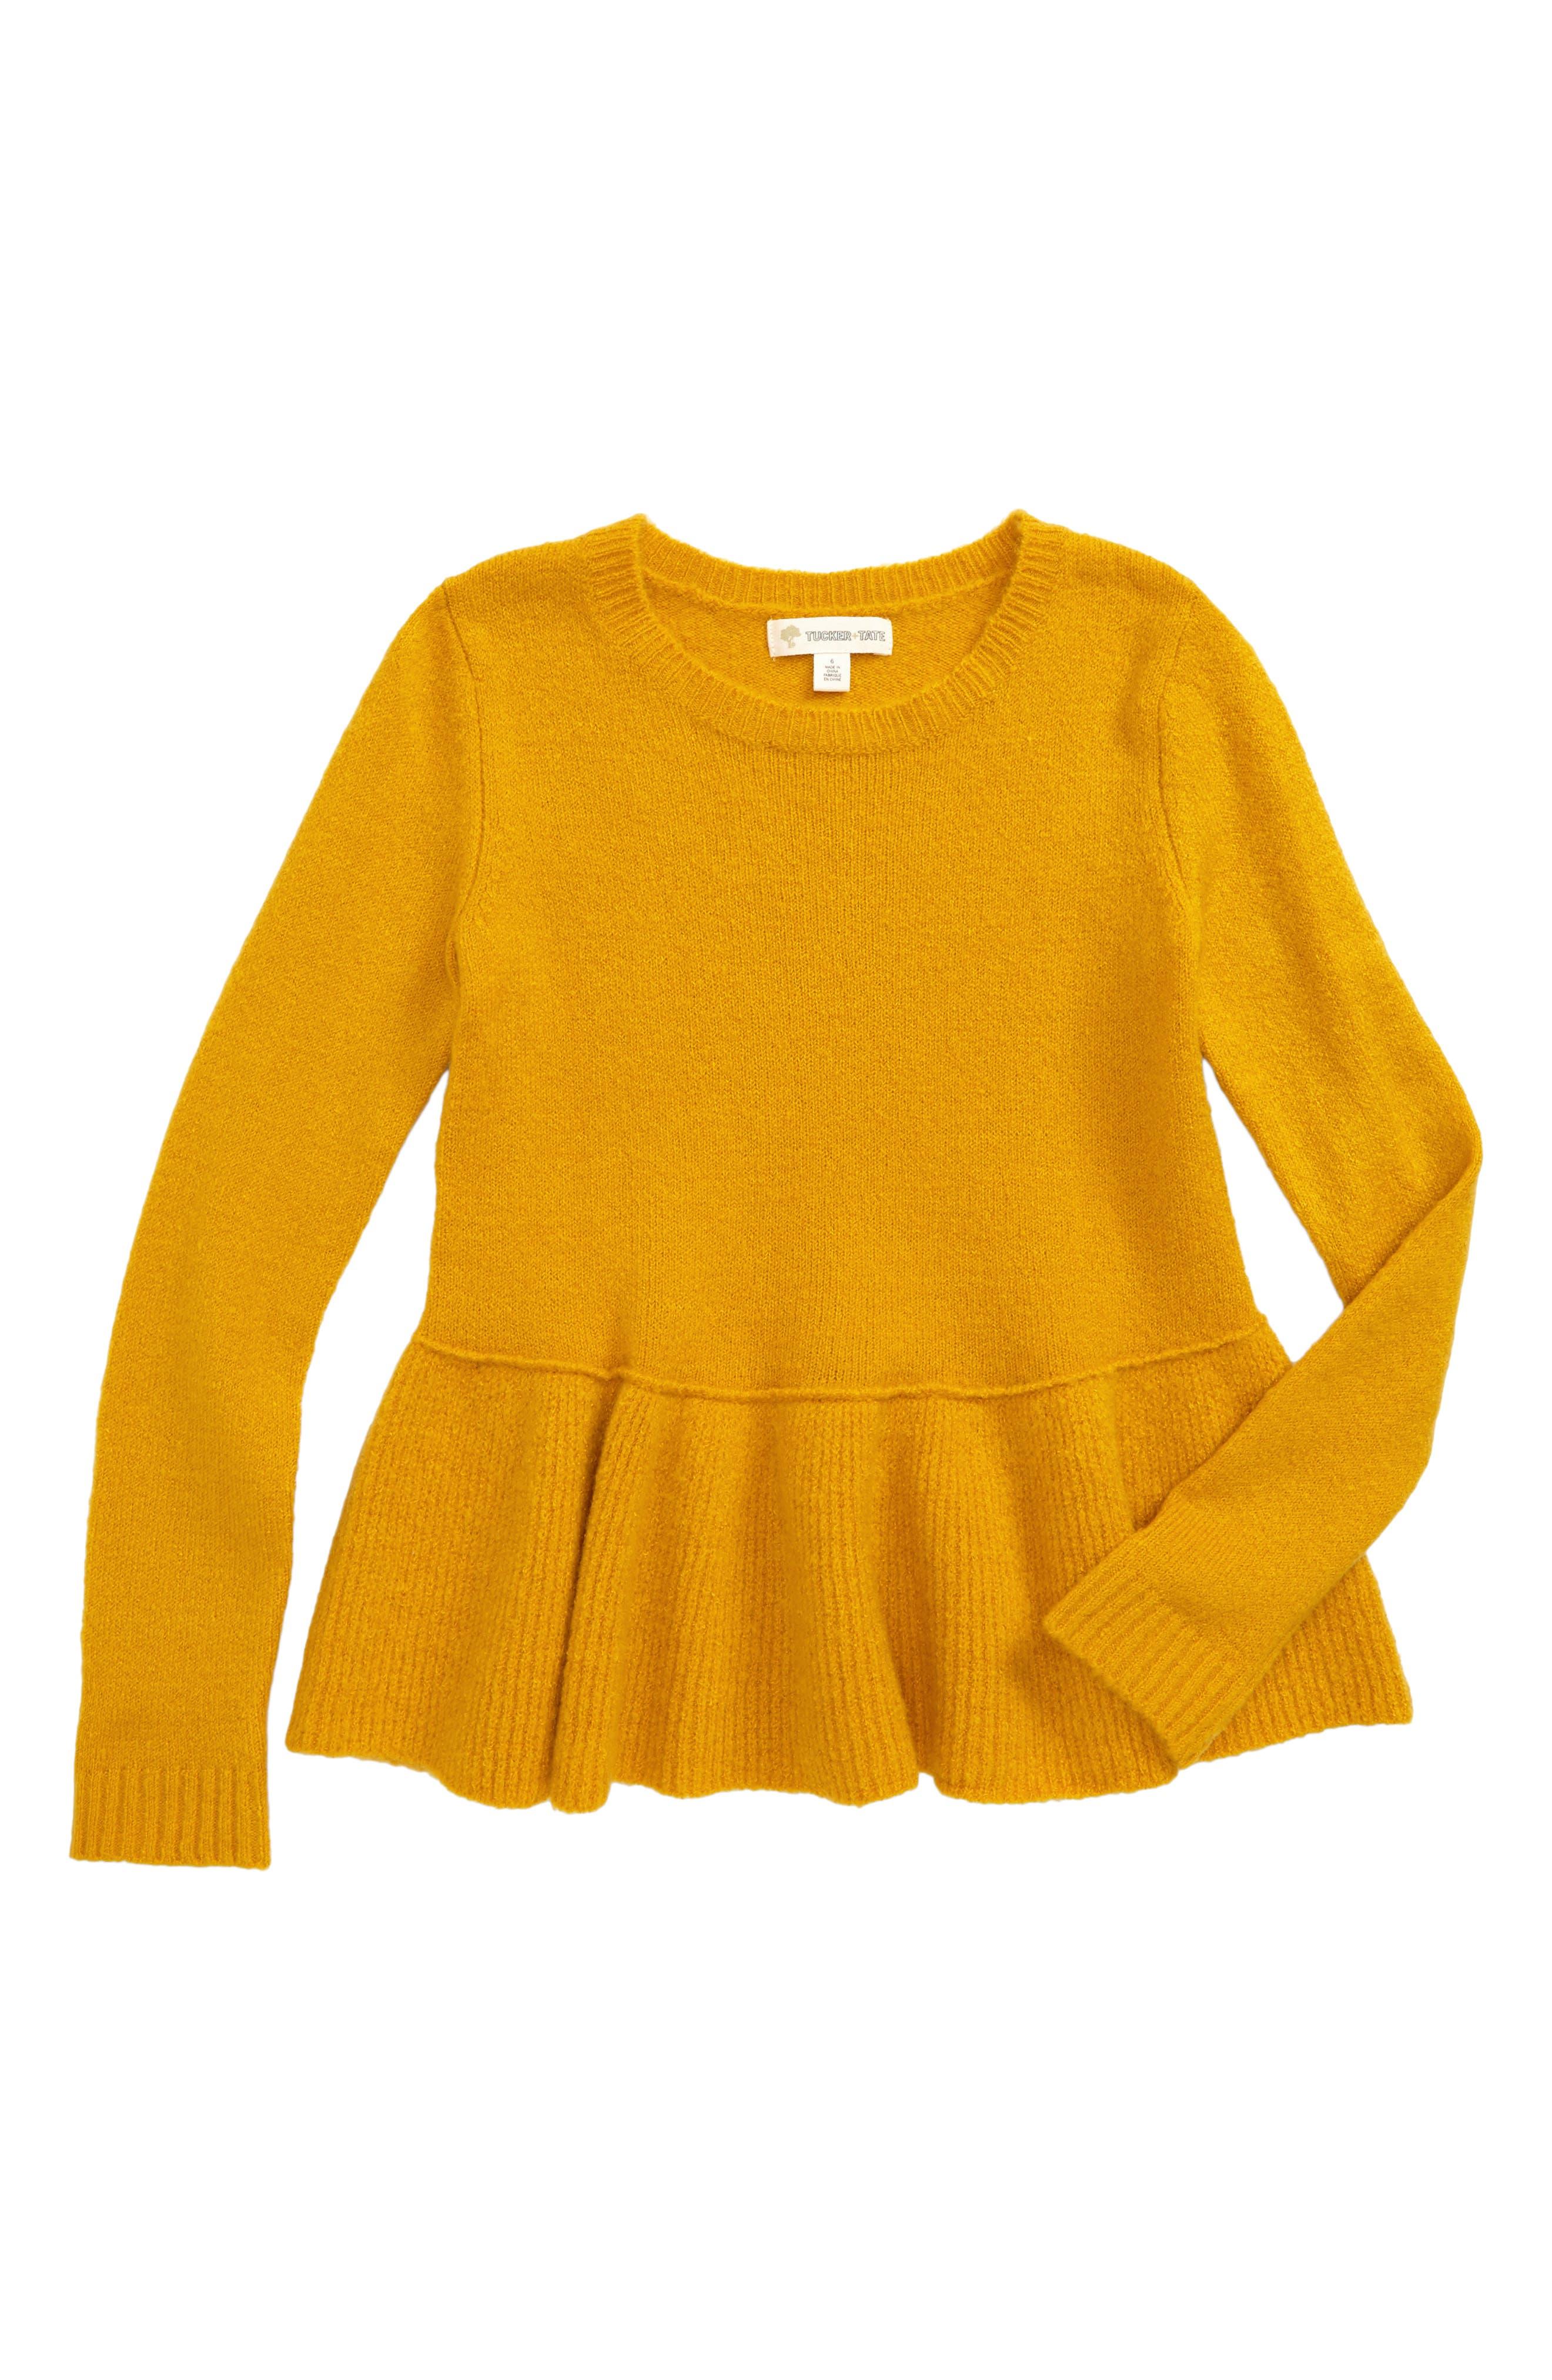 Alternate Image 1 Selected - Tucker + Tate Ruffle Hem Sweater (Toddler Girls, Little Girls & Big Girls)